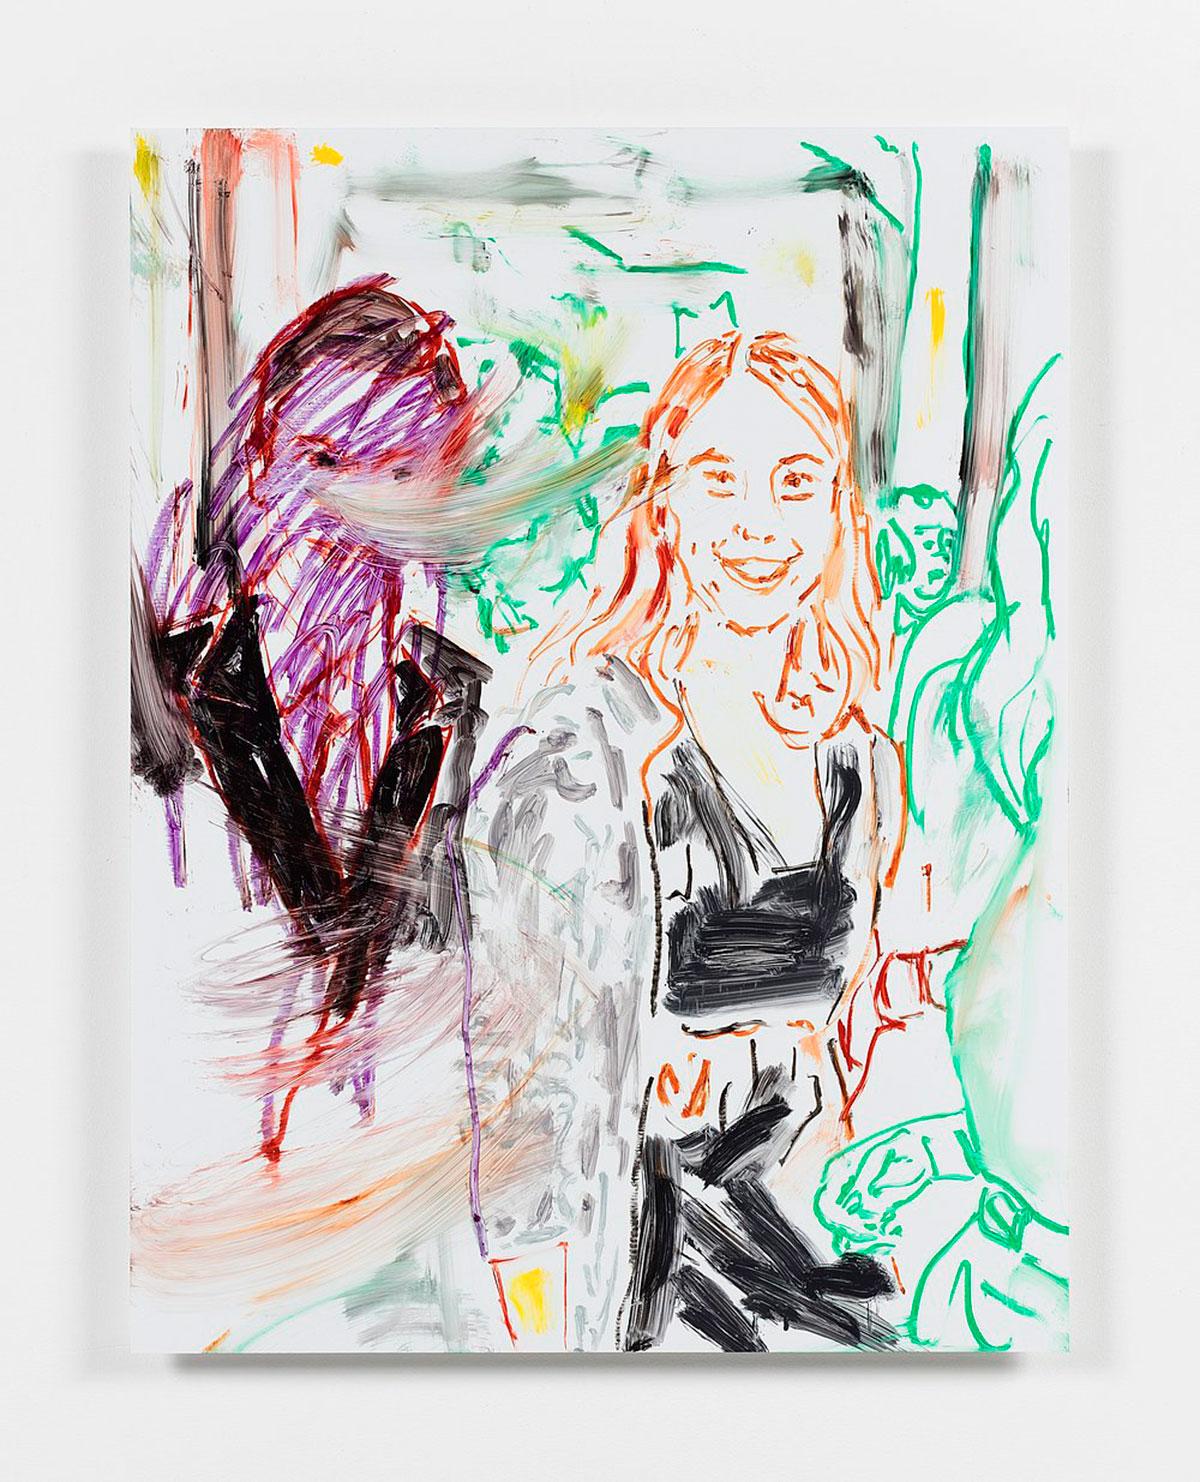 Reena Spaulings, Advisors, Detail 9 (Lisa Marks), 2016, Acrylfarbe auf Dibond, 86,4 x 66 cm, © Courtesy of the artist, Private Sammlung und Campoli Presti, London/Paris